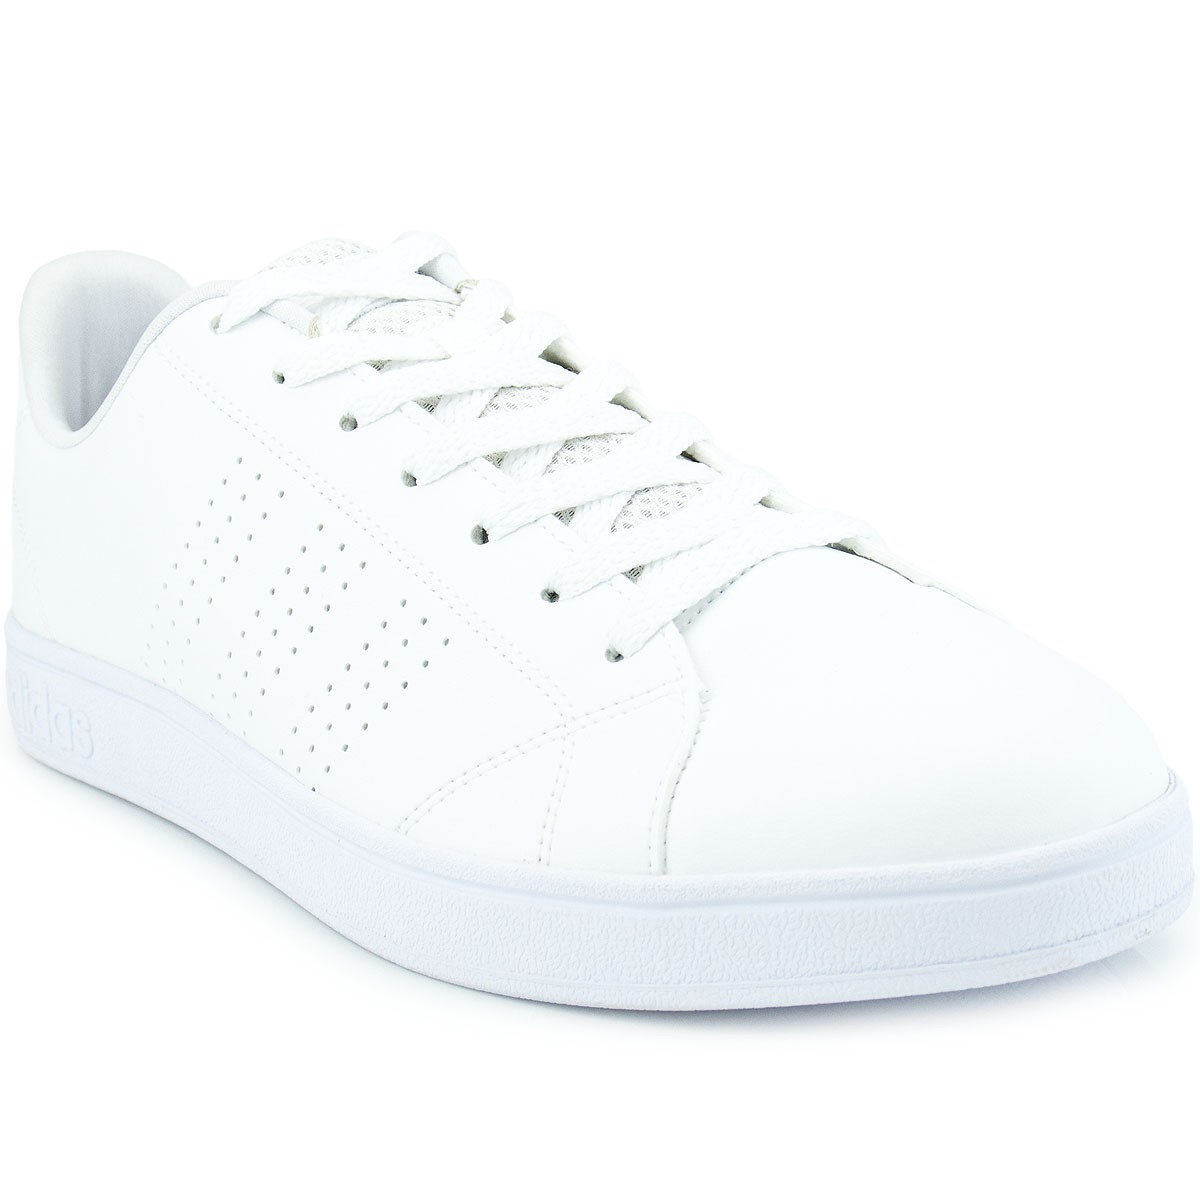 Tênis Adidas Advantage VS Clean B74685  9810743ffd2c9